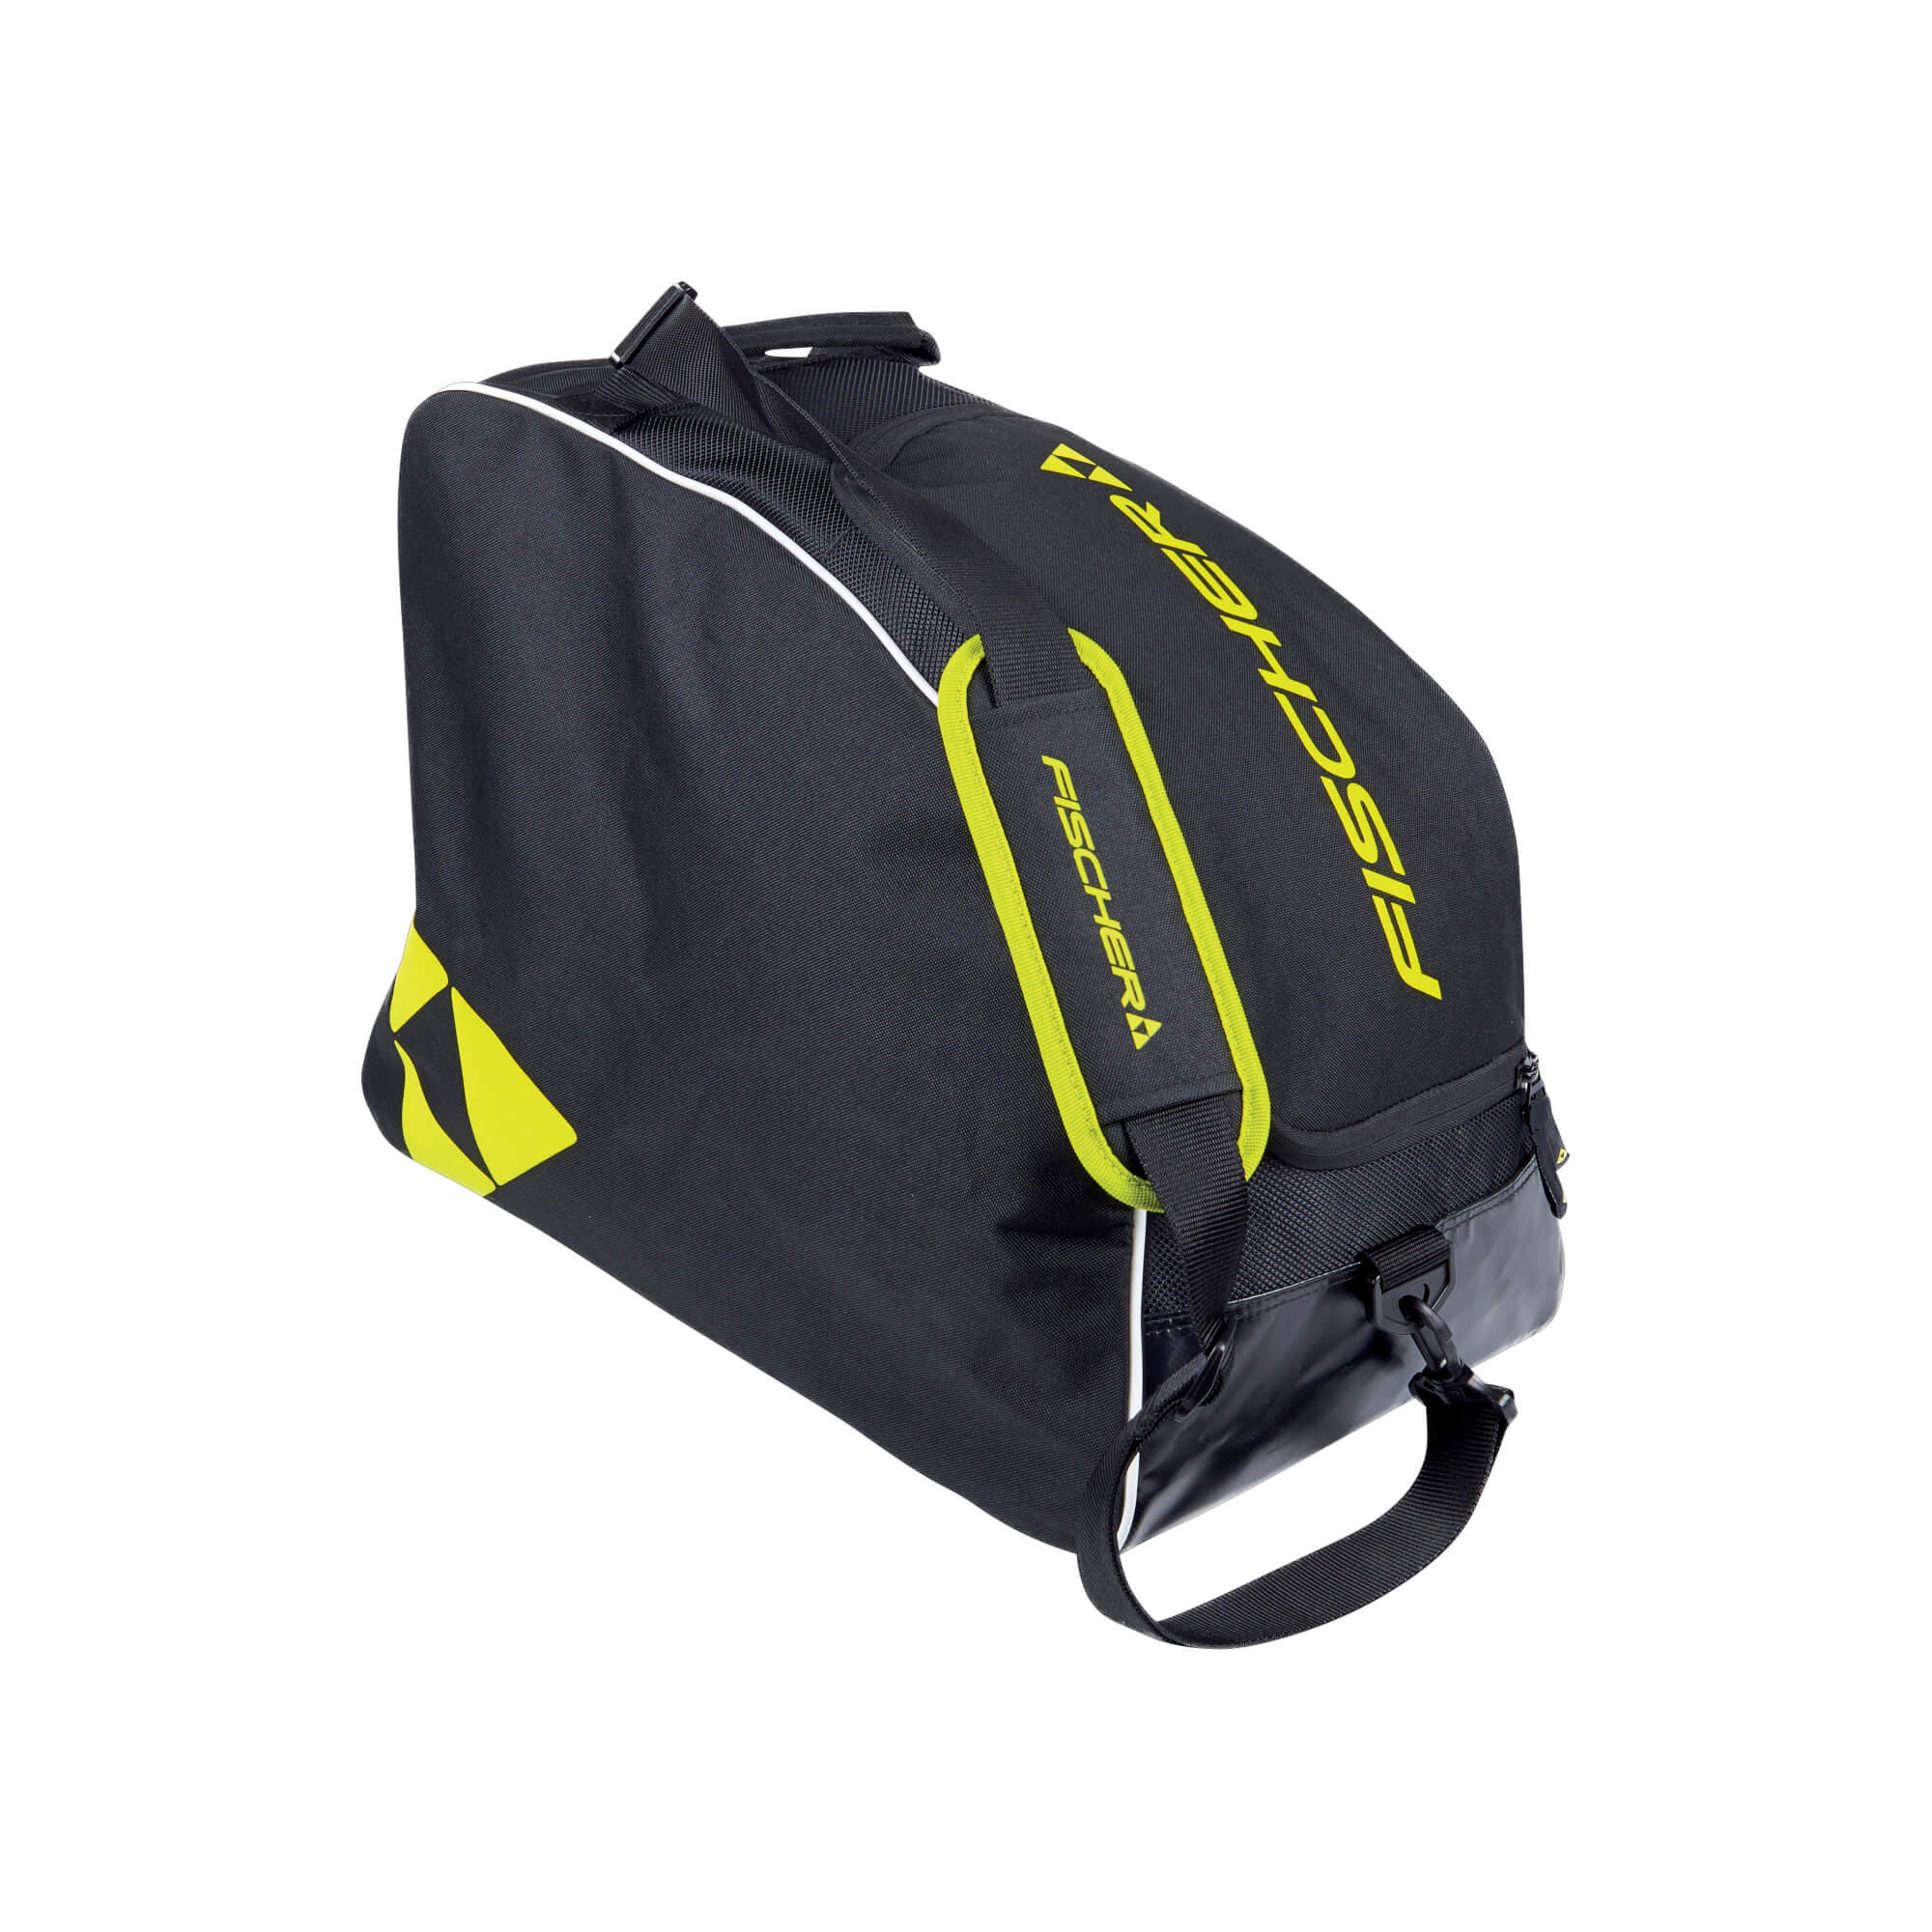 Helmet Bag Alpine Eco imagine produs